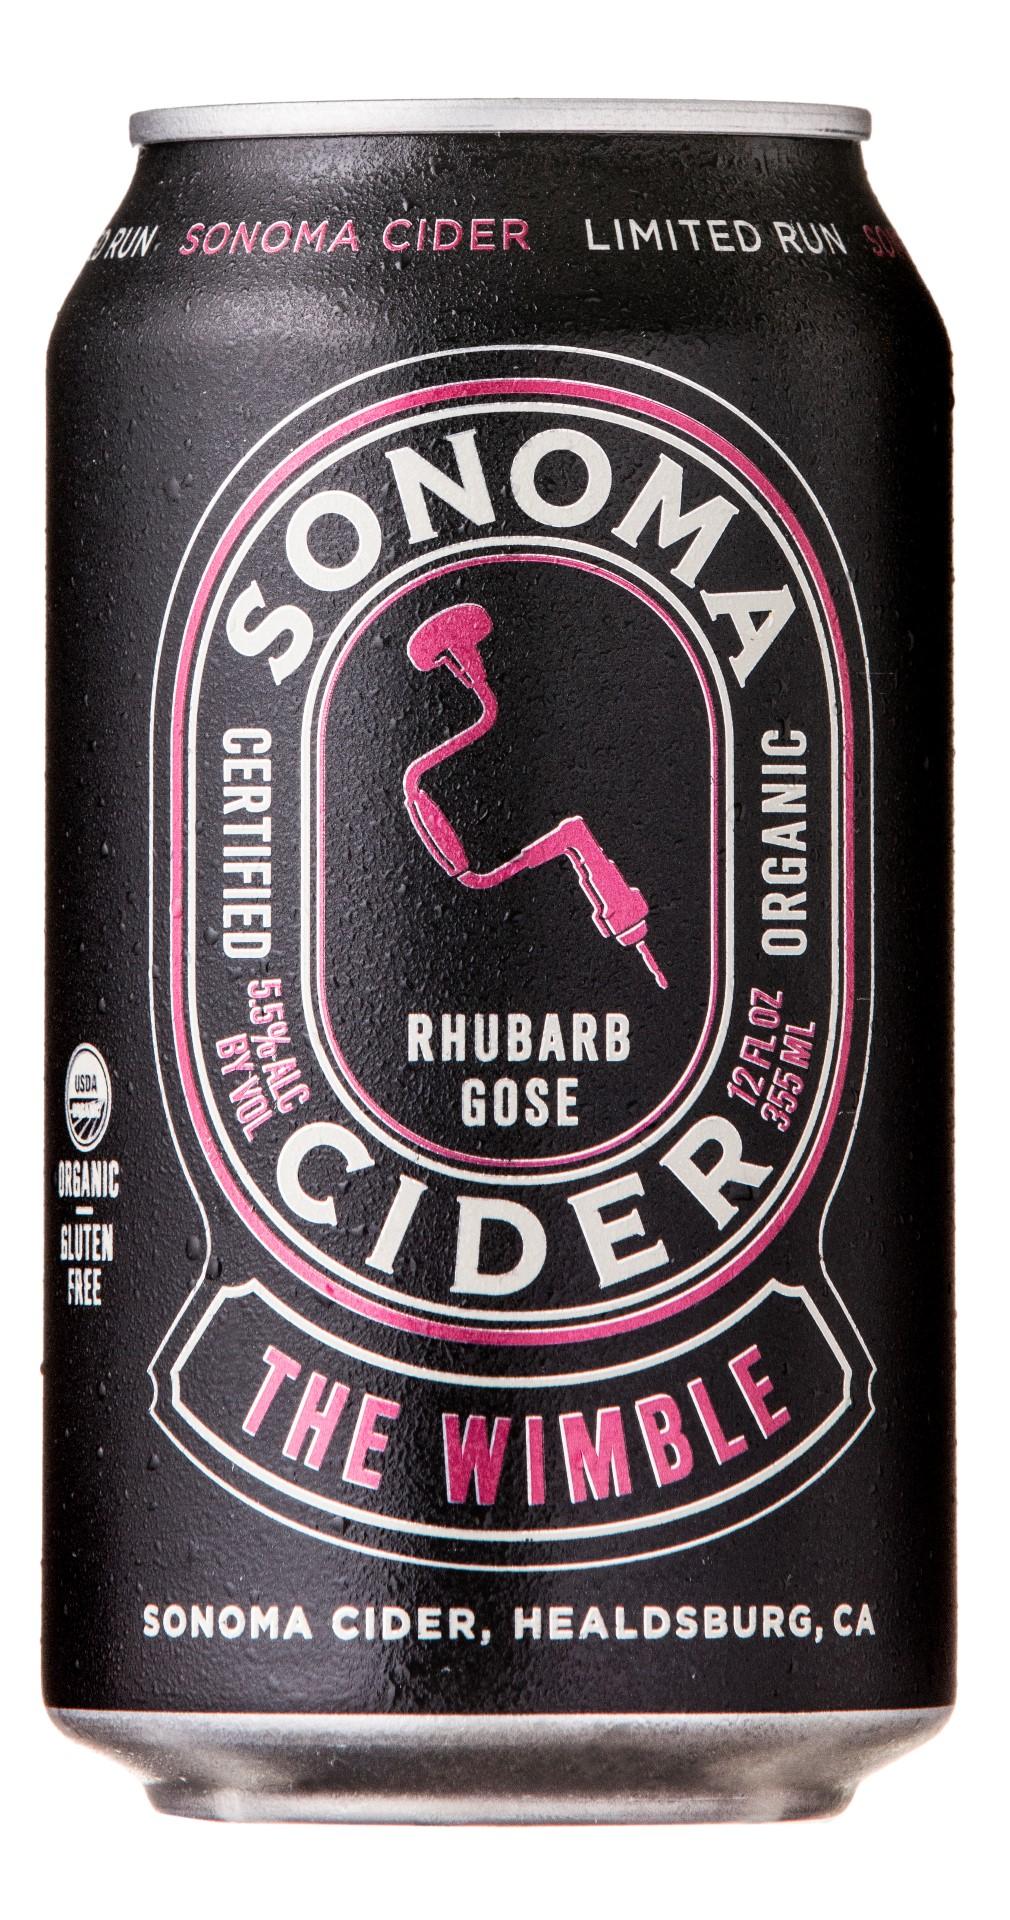 Sonoma Cider The Wimble